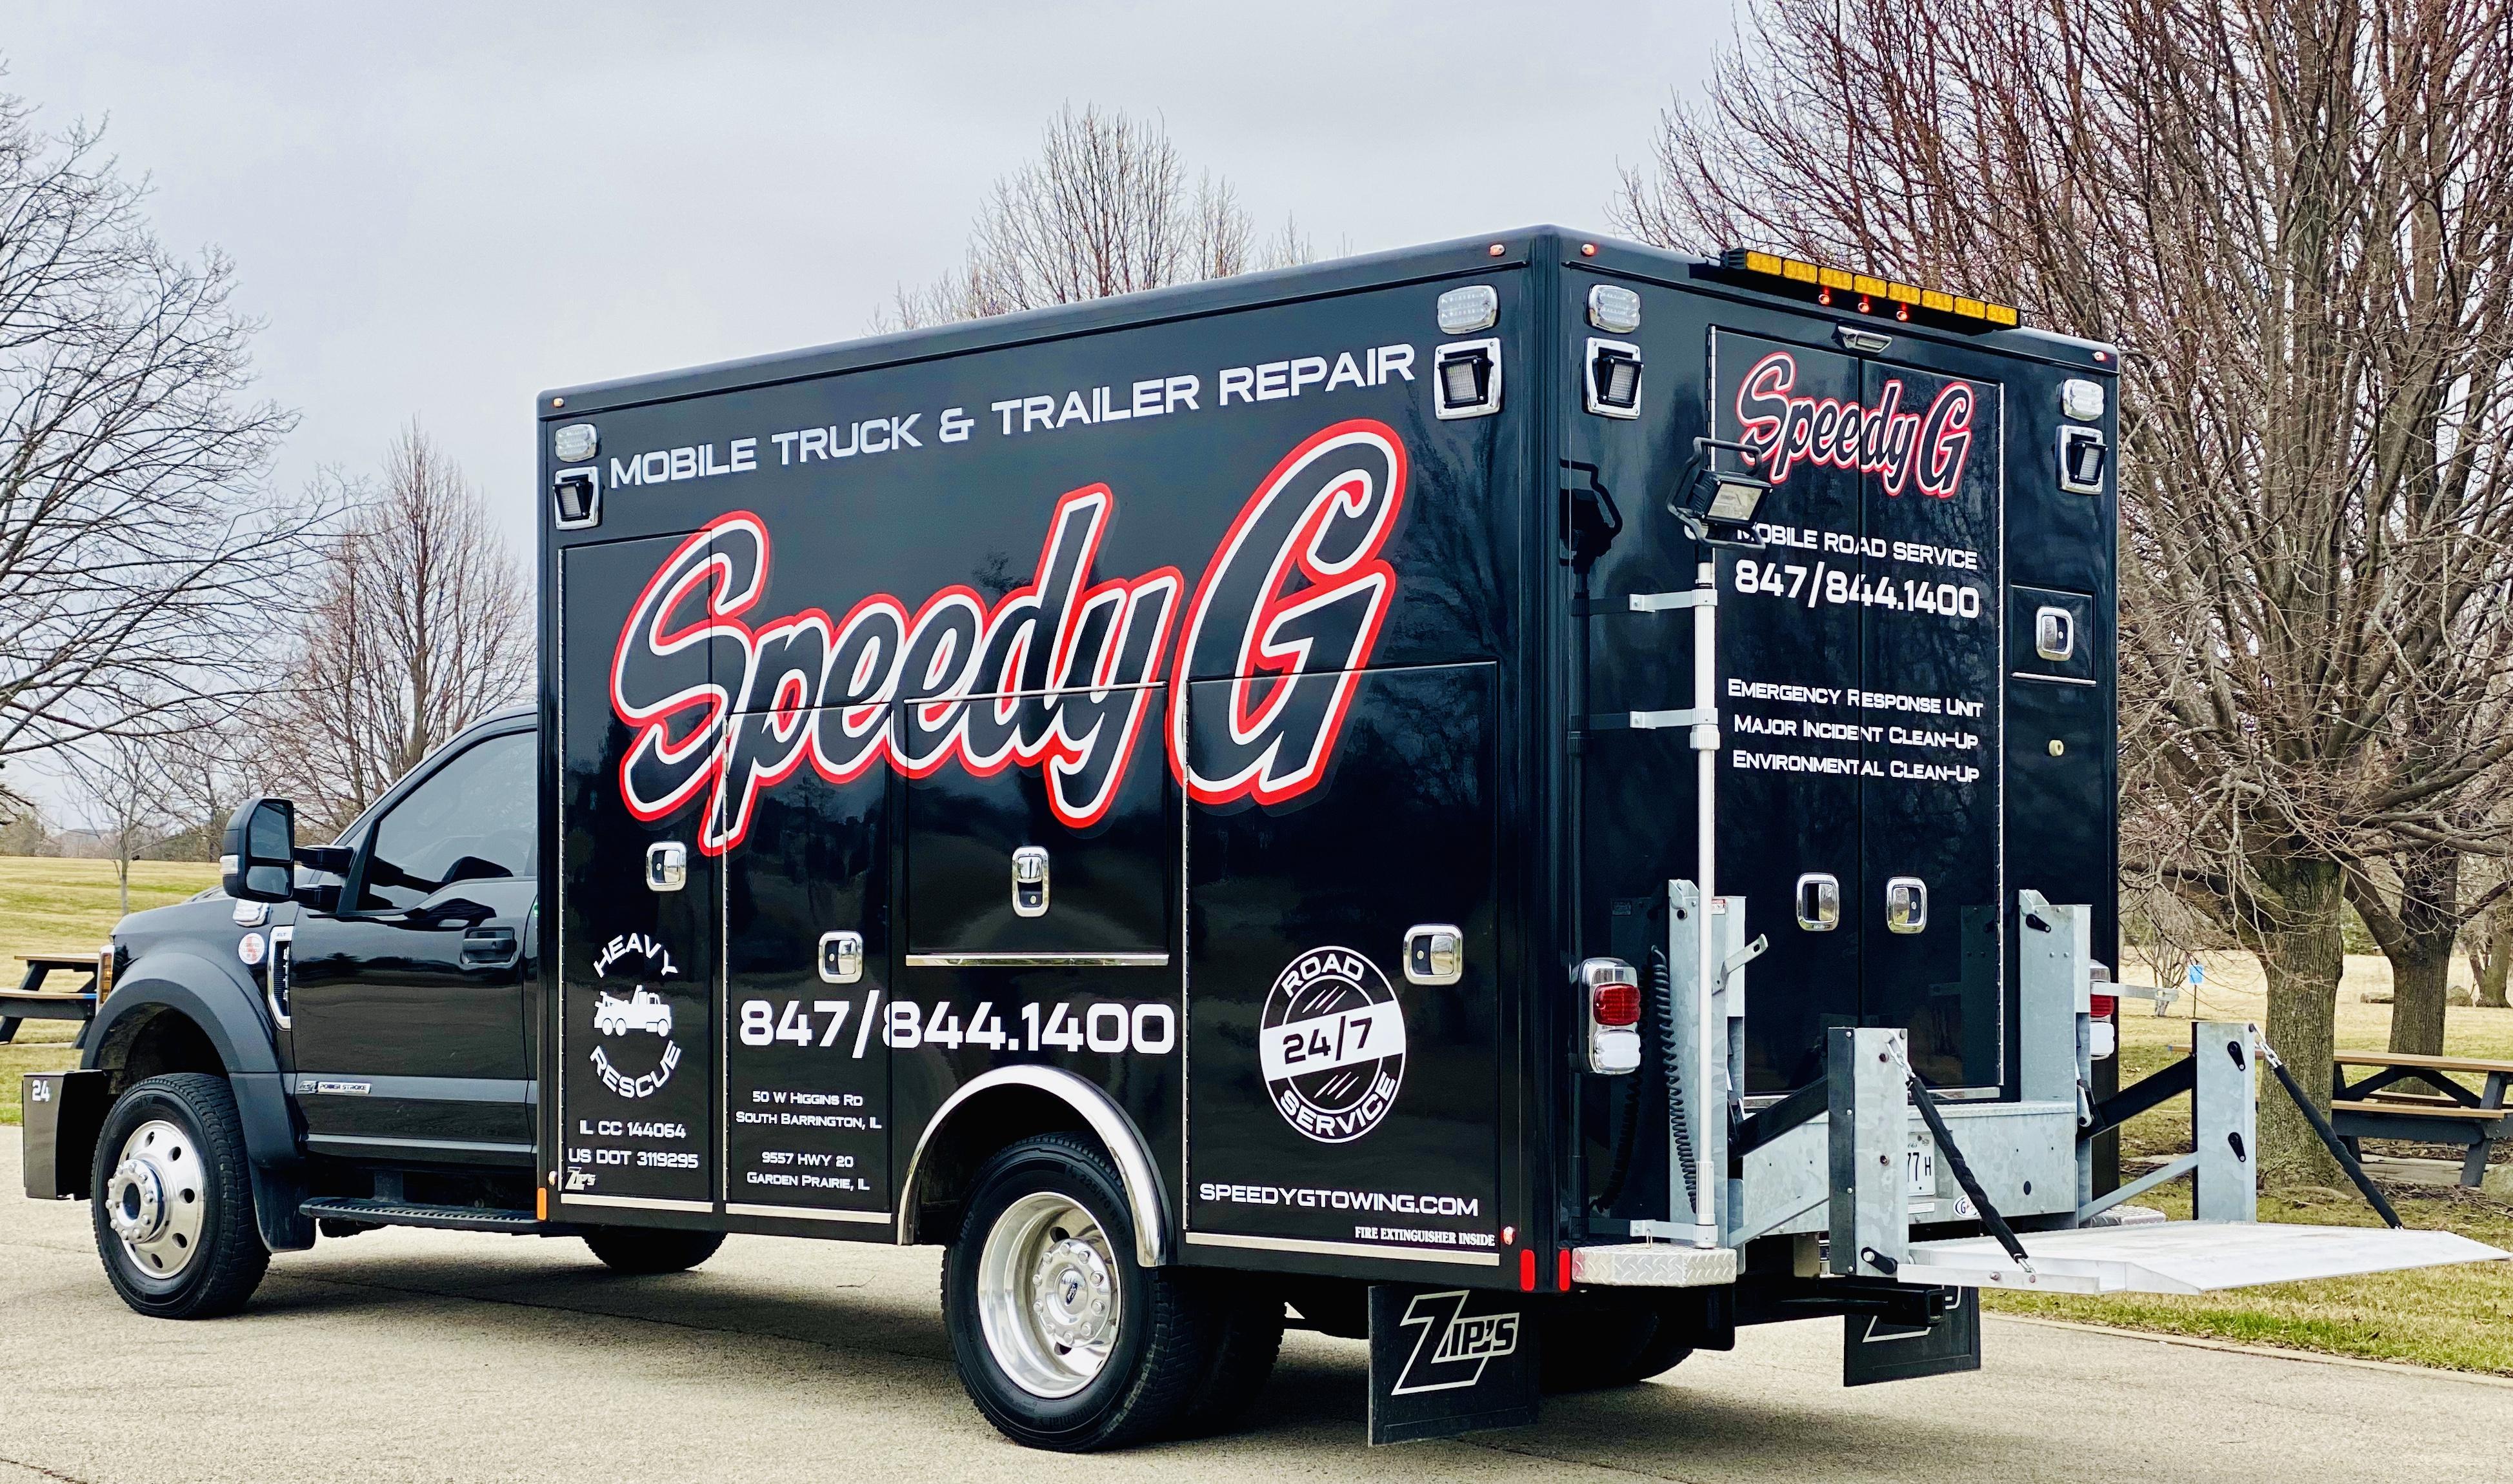 Mobile On-site Truck & Trailer Repair Near You, Belvidere IL, On-Road Semi Truck Repairs in 61008